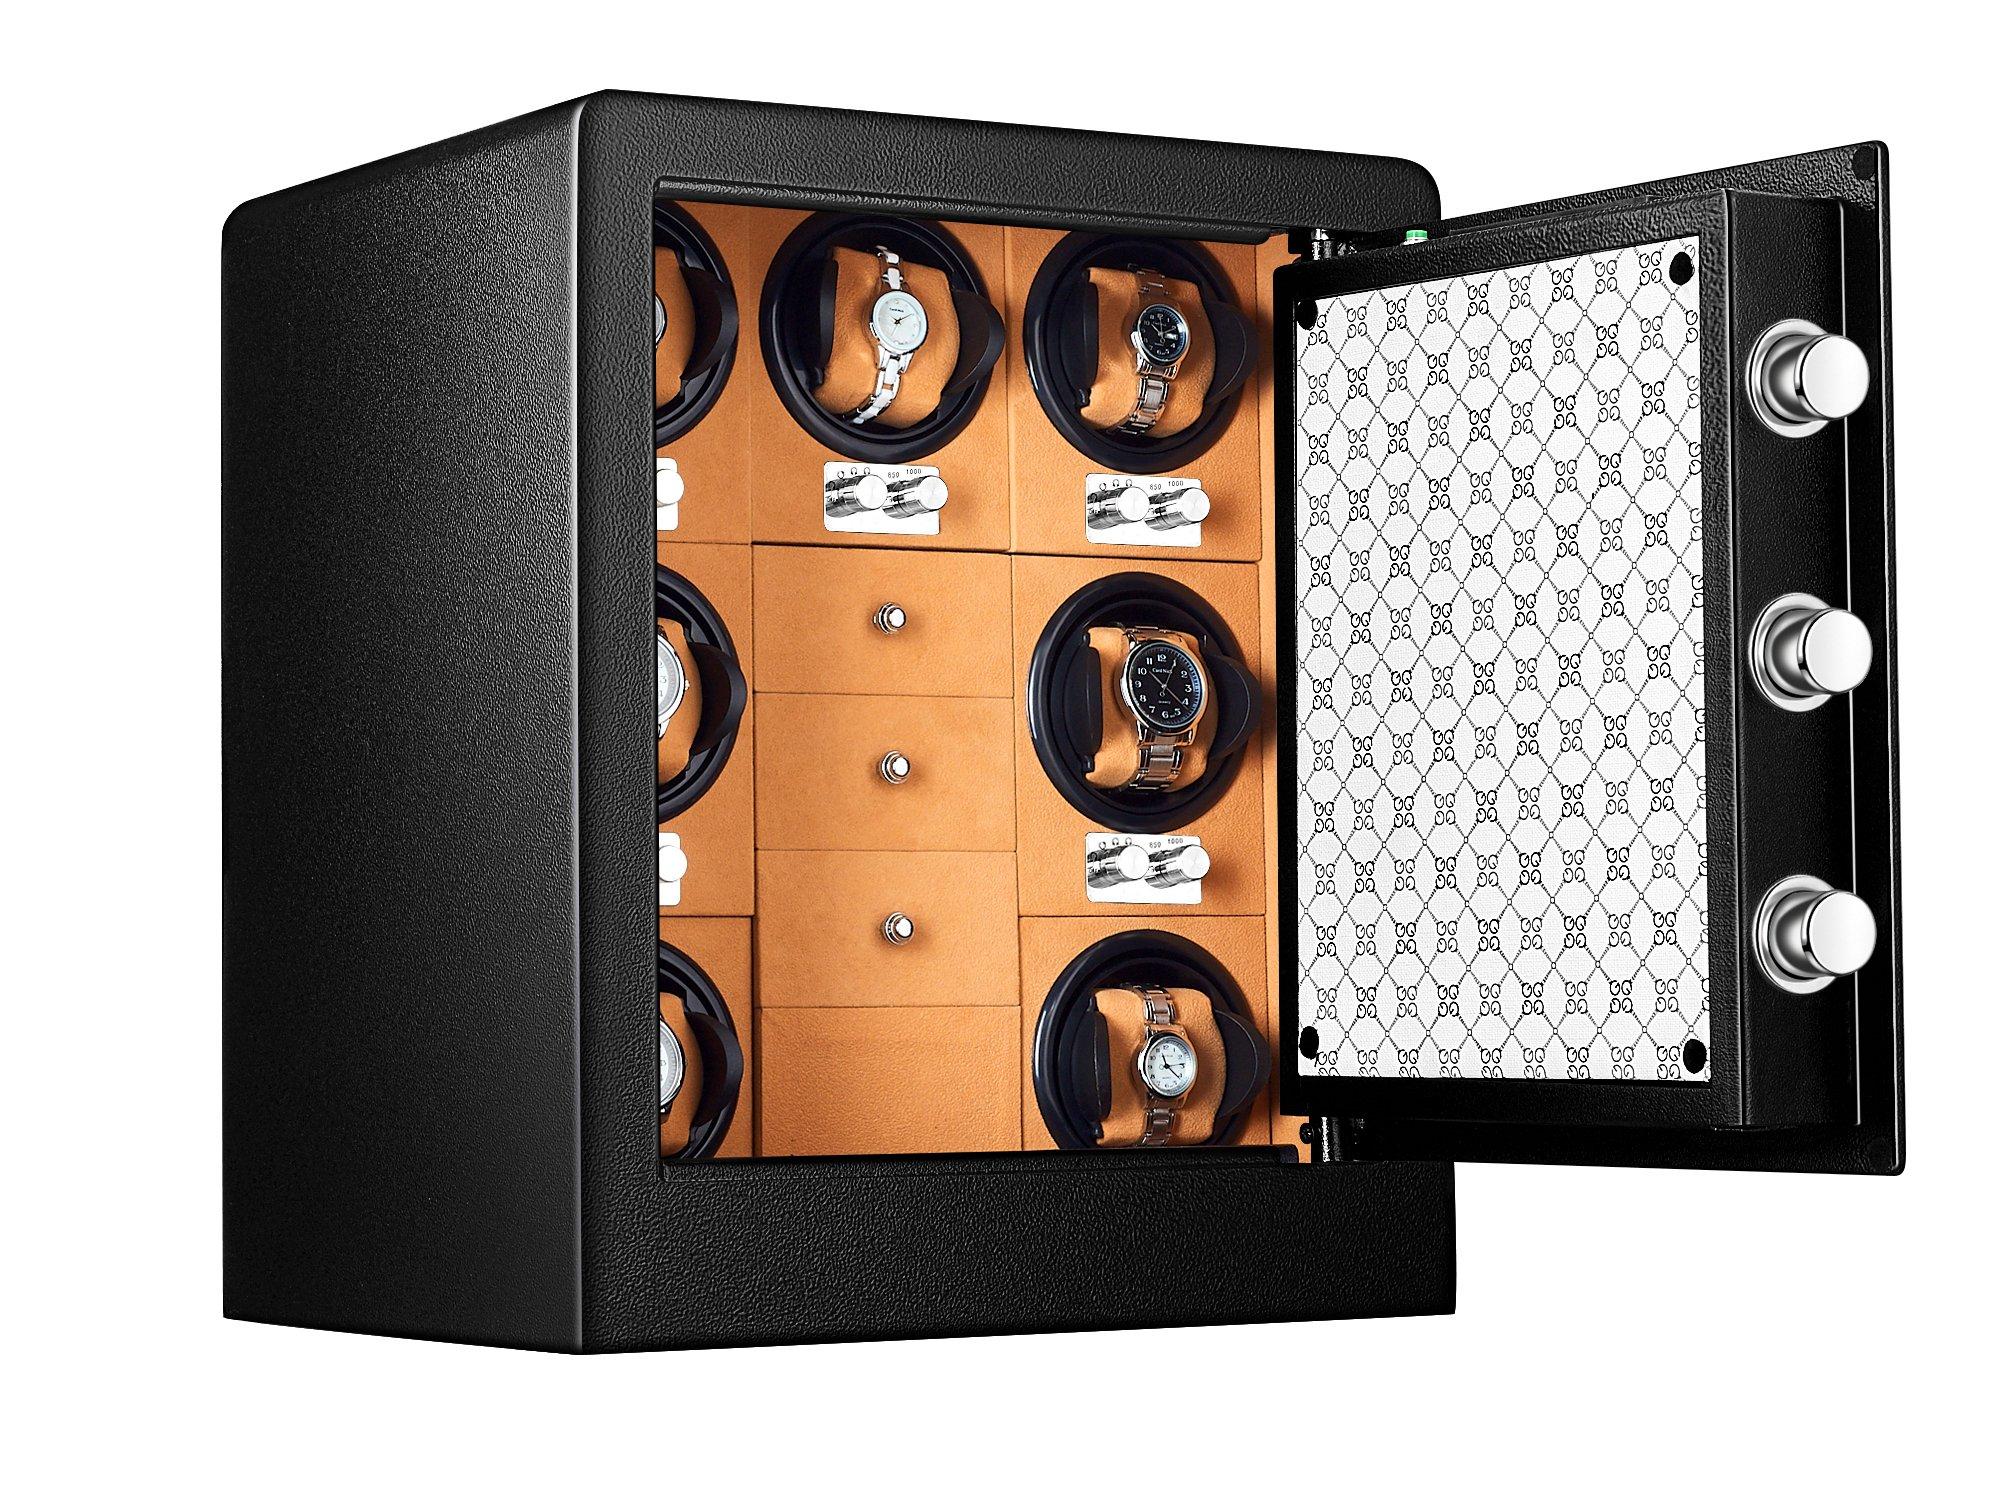 JQUEEN 7 Watch Winder Safe Box with Fingerprint Safe Cabinet, 1.85-Cubic Feet by JQUEEN (Image #2)